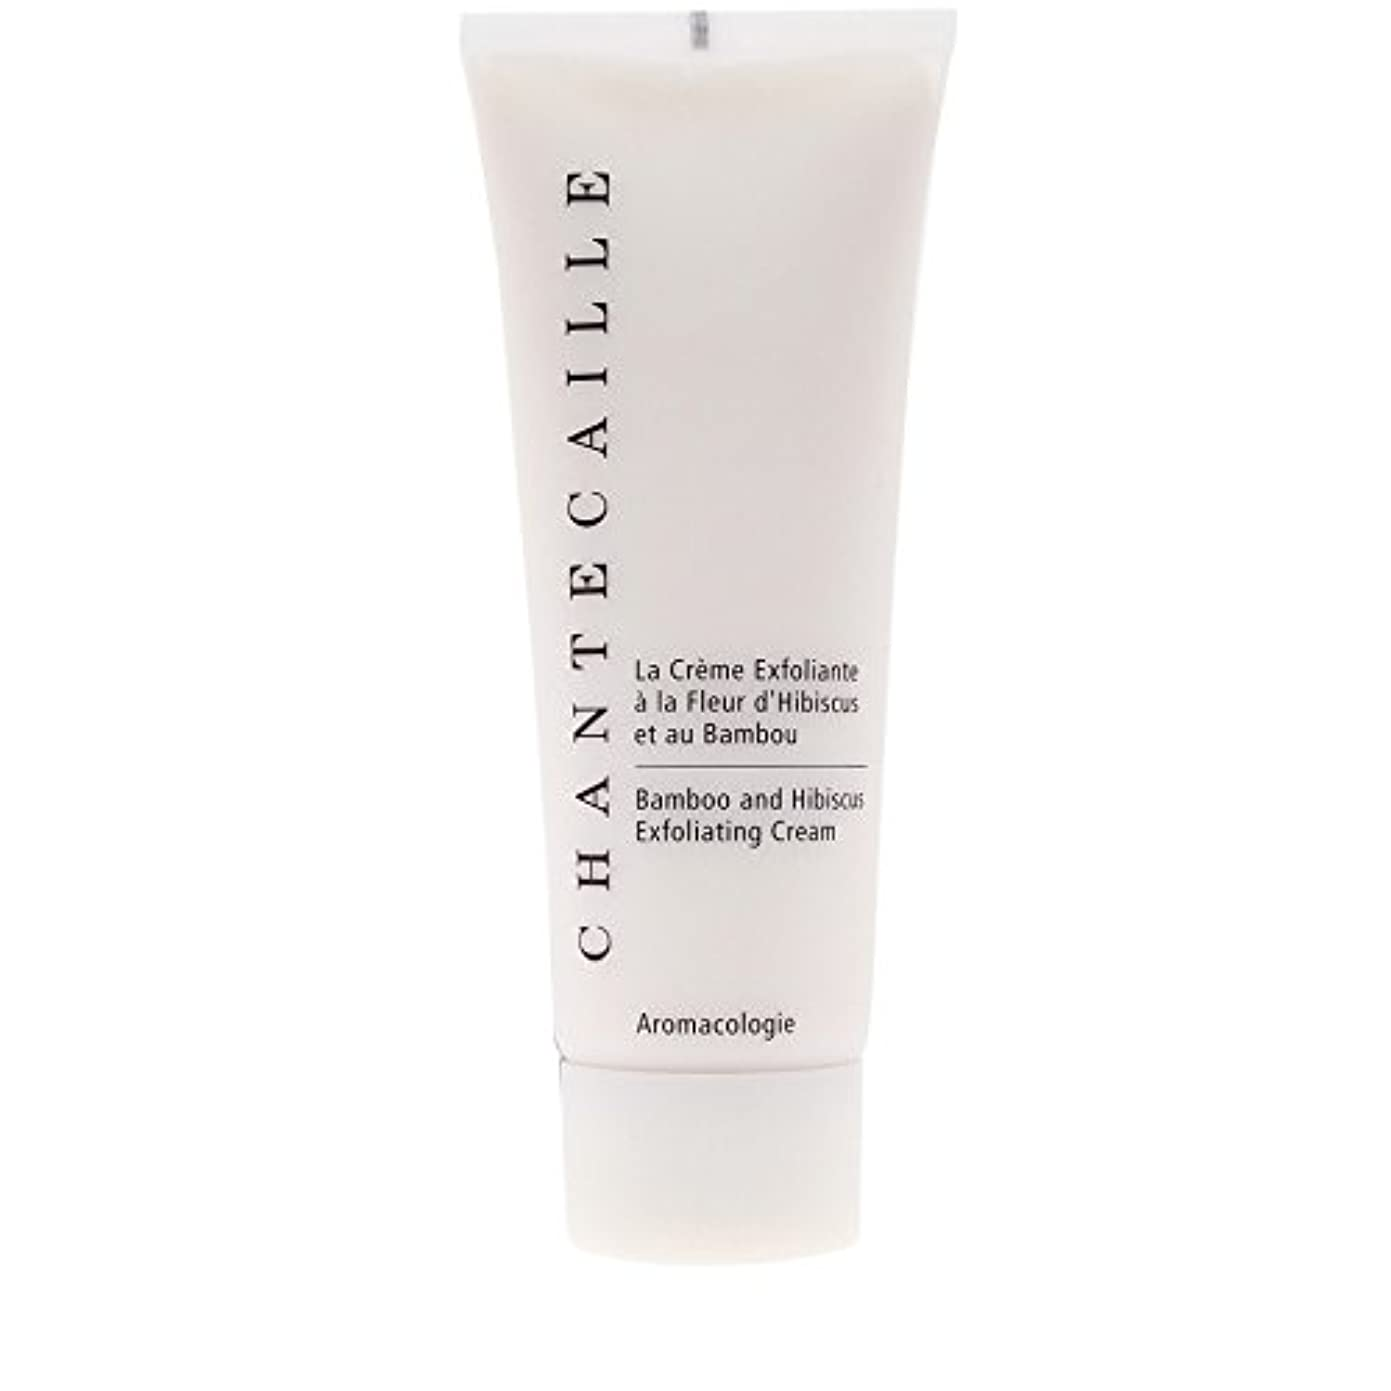 Chantecaille Bamboo and Hibiscus Exfoliating Cream 75ml (Pack of 6) - シャンテカイユ竹とハイビスカス角質除去クリーム75ミリリットル x6 [並行輸入品]